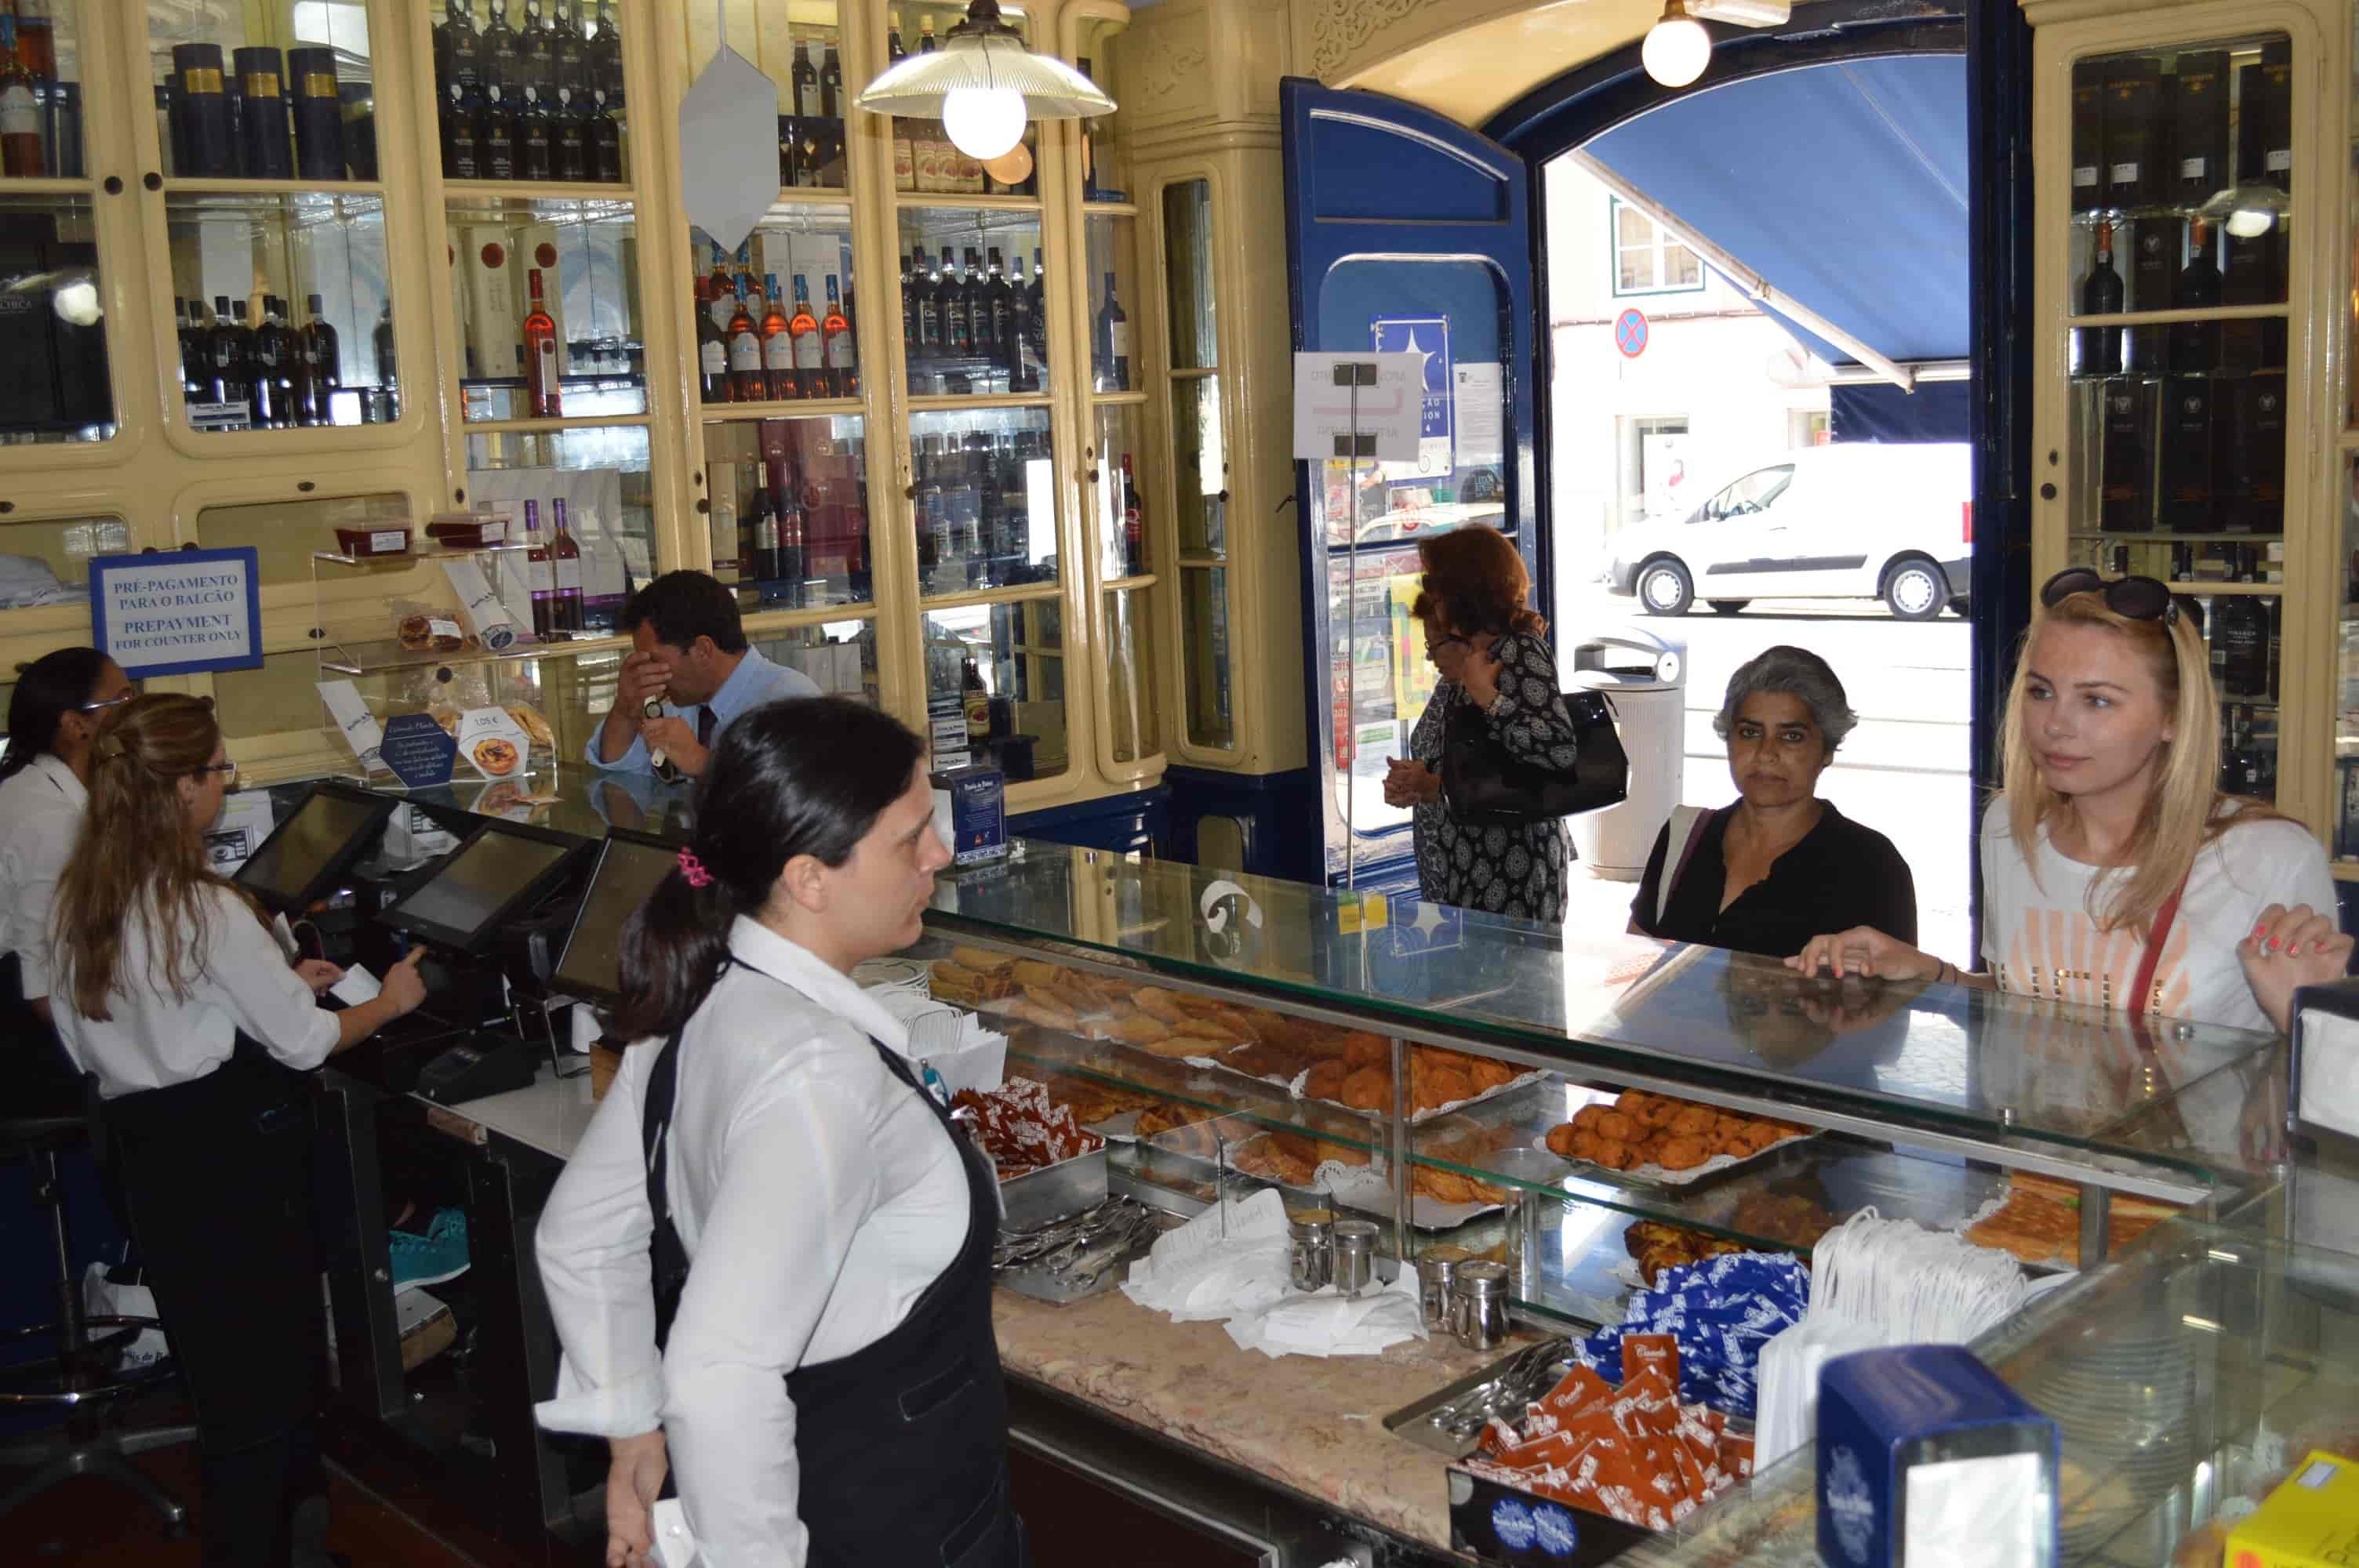 Lobby of the Pasteis de Belem shop in Lisbon